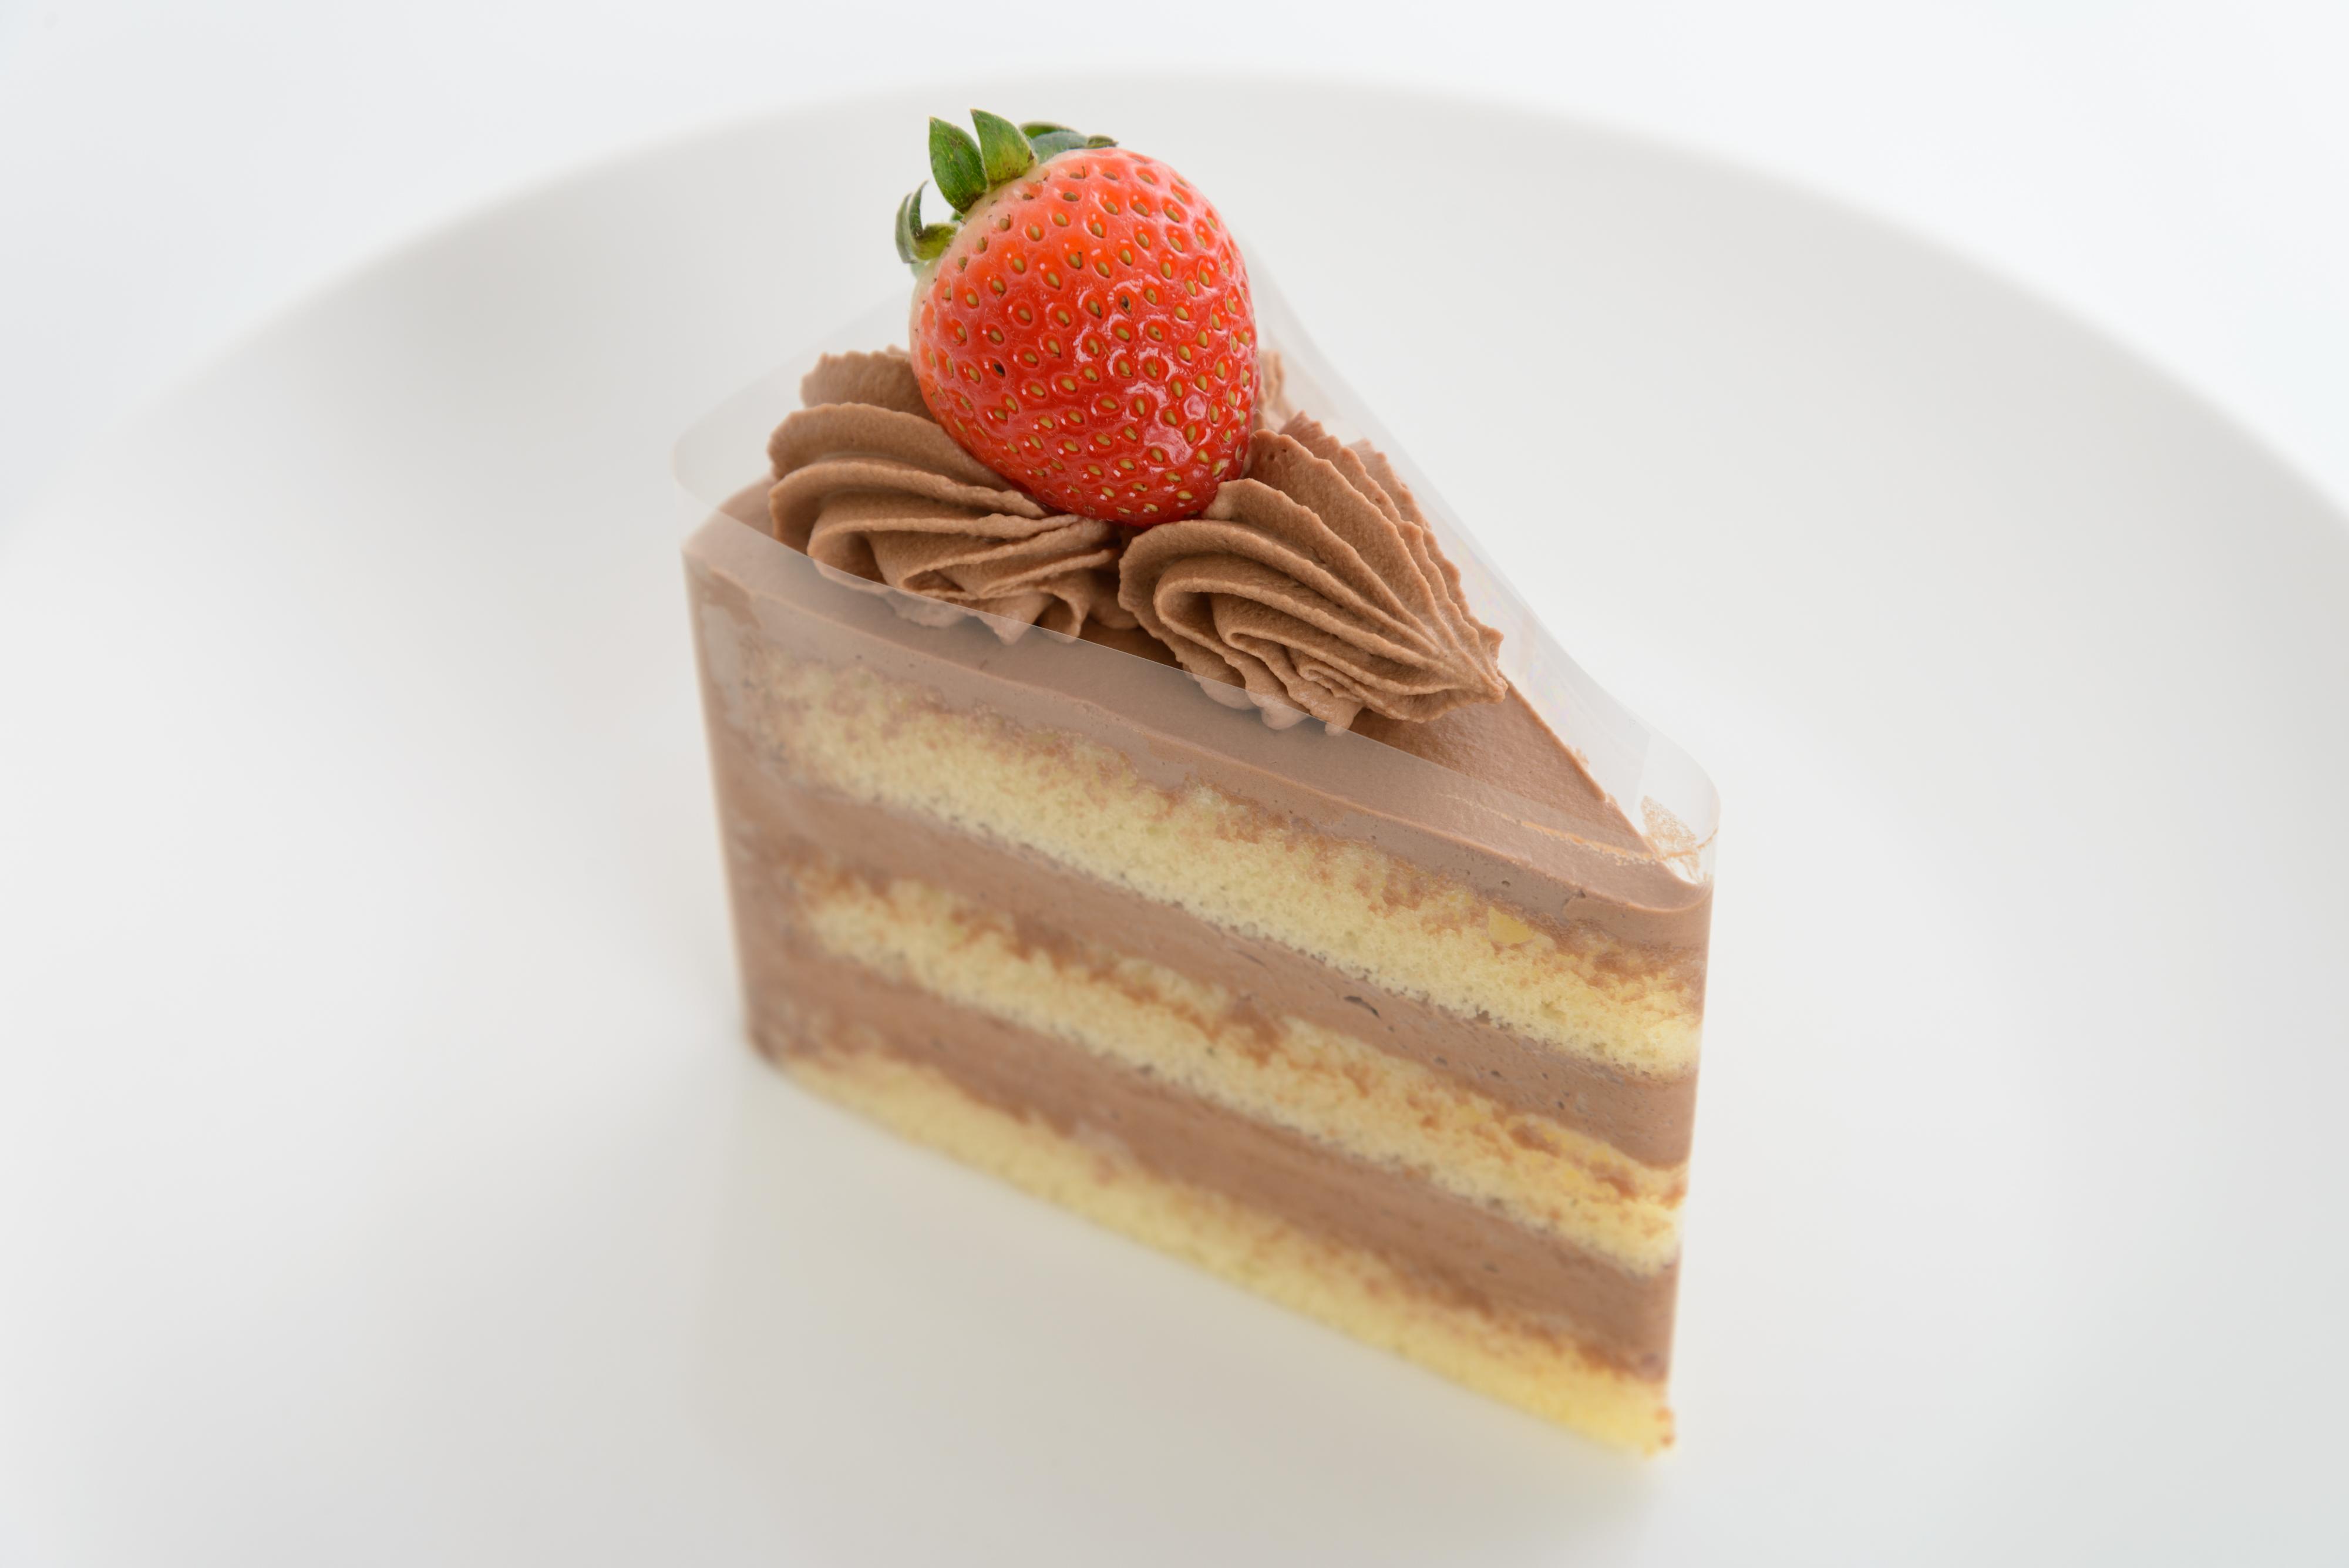 <H1>生チョコ</H1> 350円/軽い口当たりのチョコレートケーキ。 お子様にも人気です。